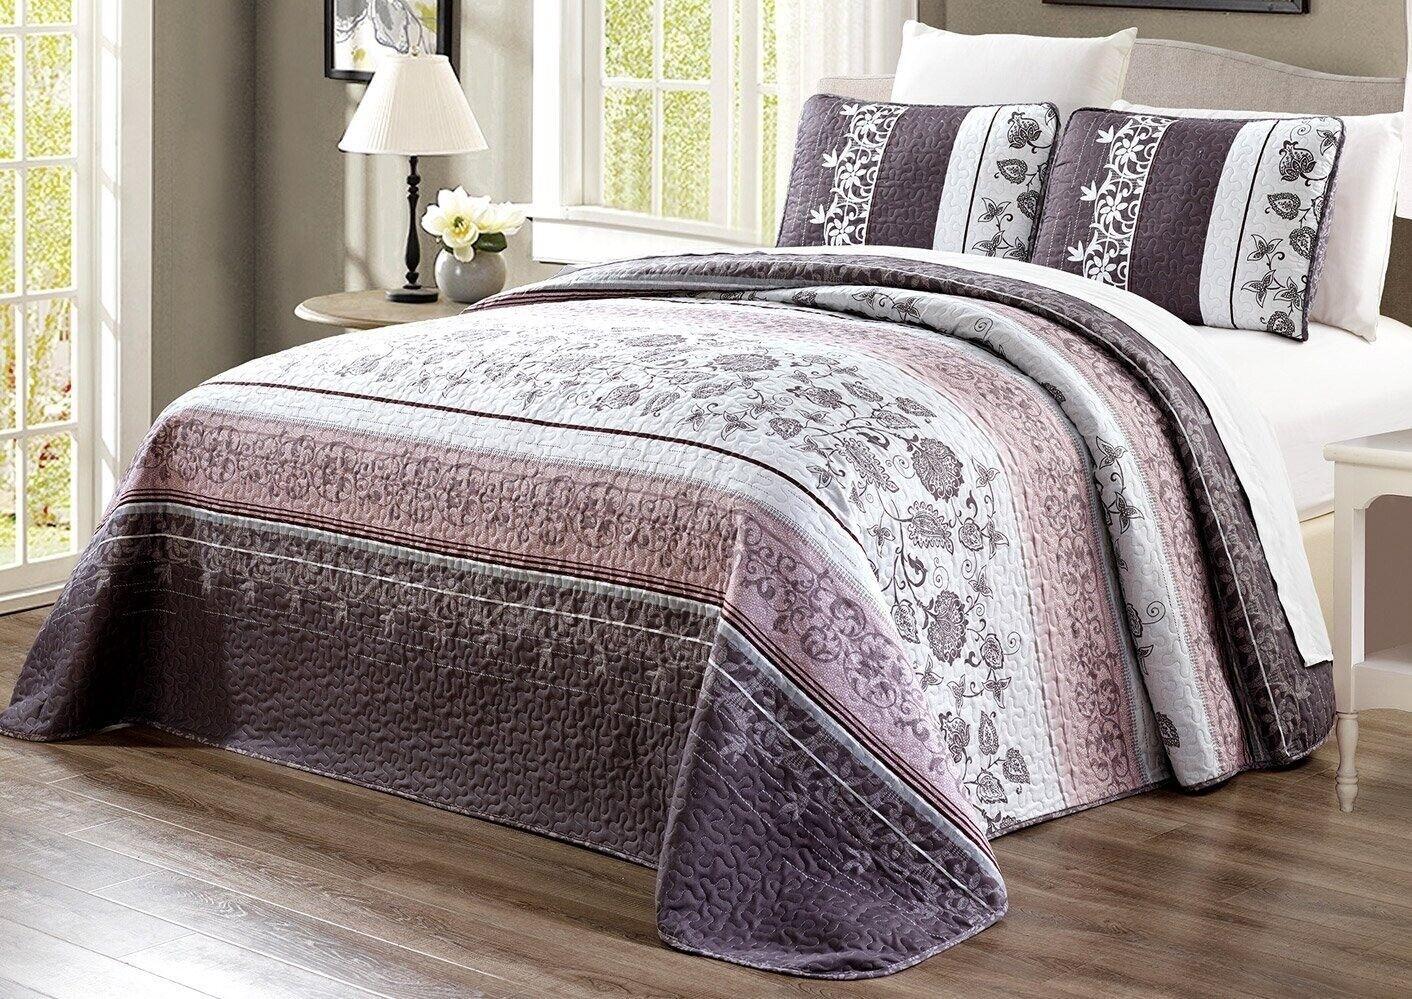 Purple Grey Black Floral Quilt Reversible FULL / QUEEN Size